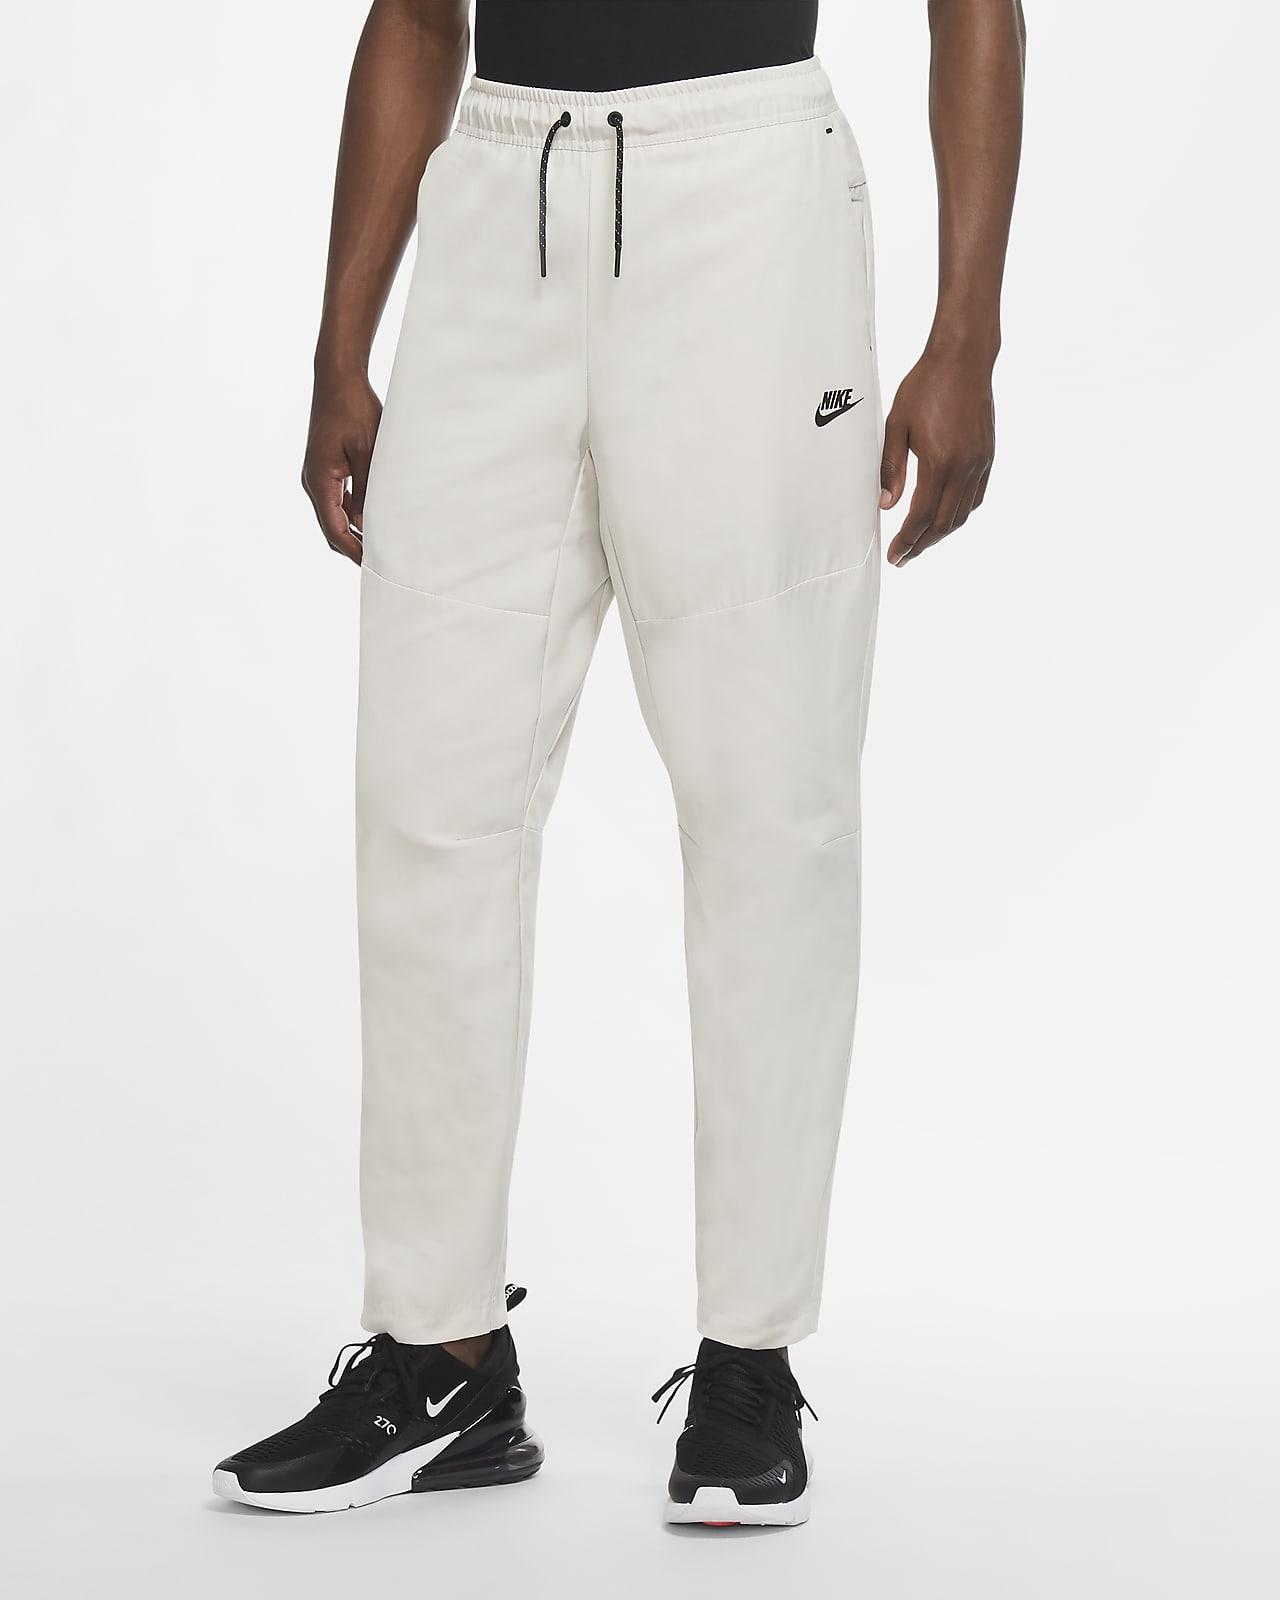 Nike Sportswear Tech Essentials Pantalón repelente al agua - Hombre